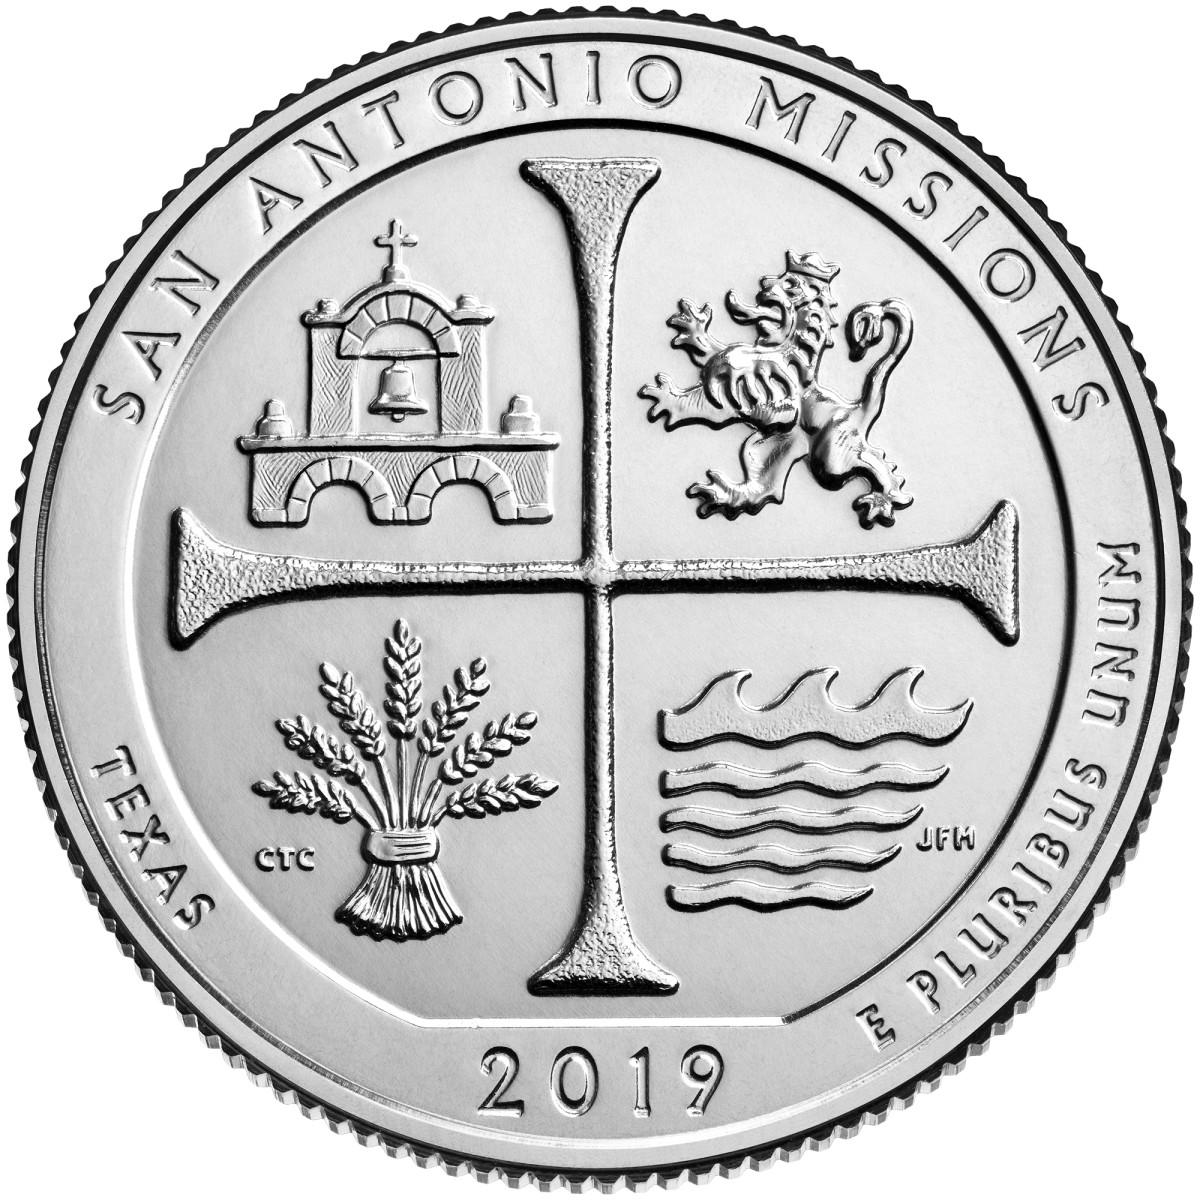 (image courtesy of the US Mint)